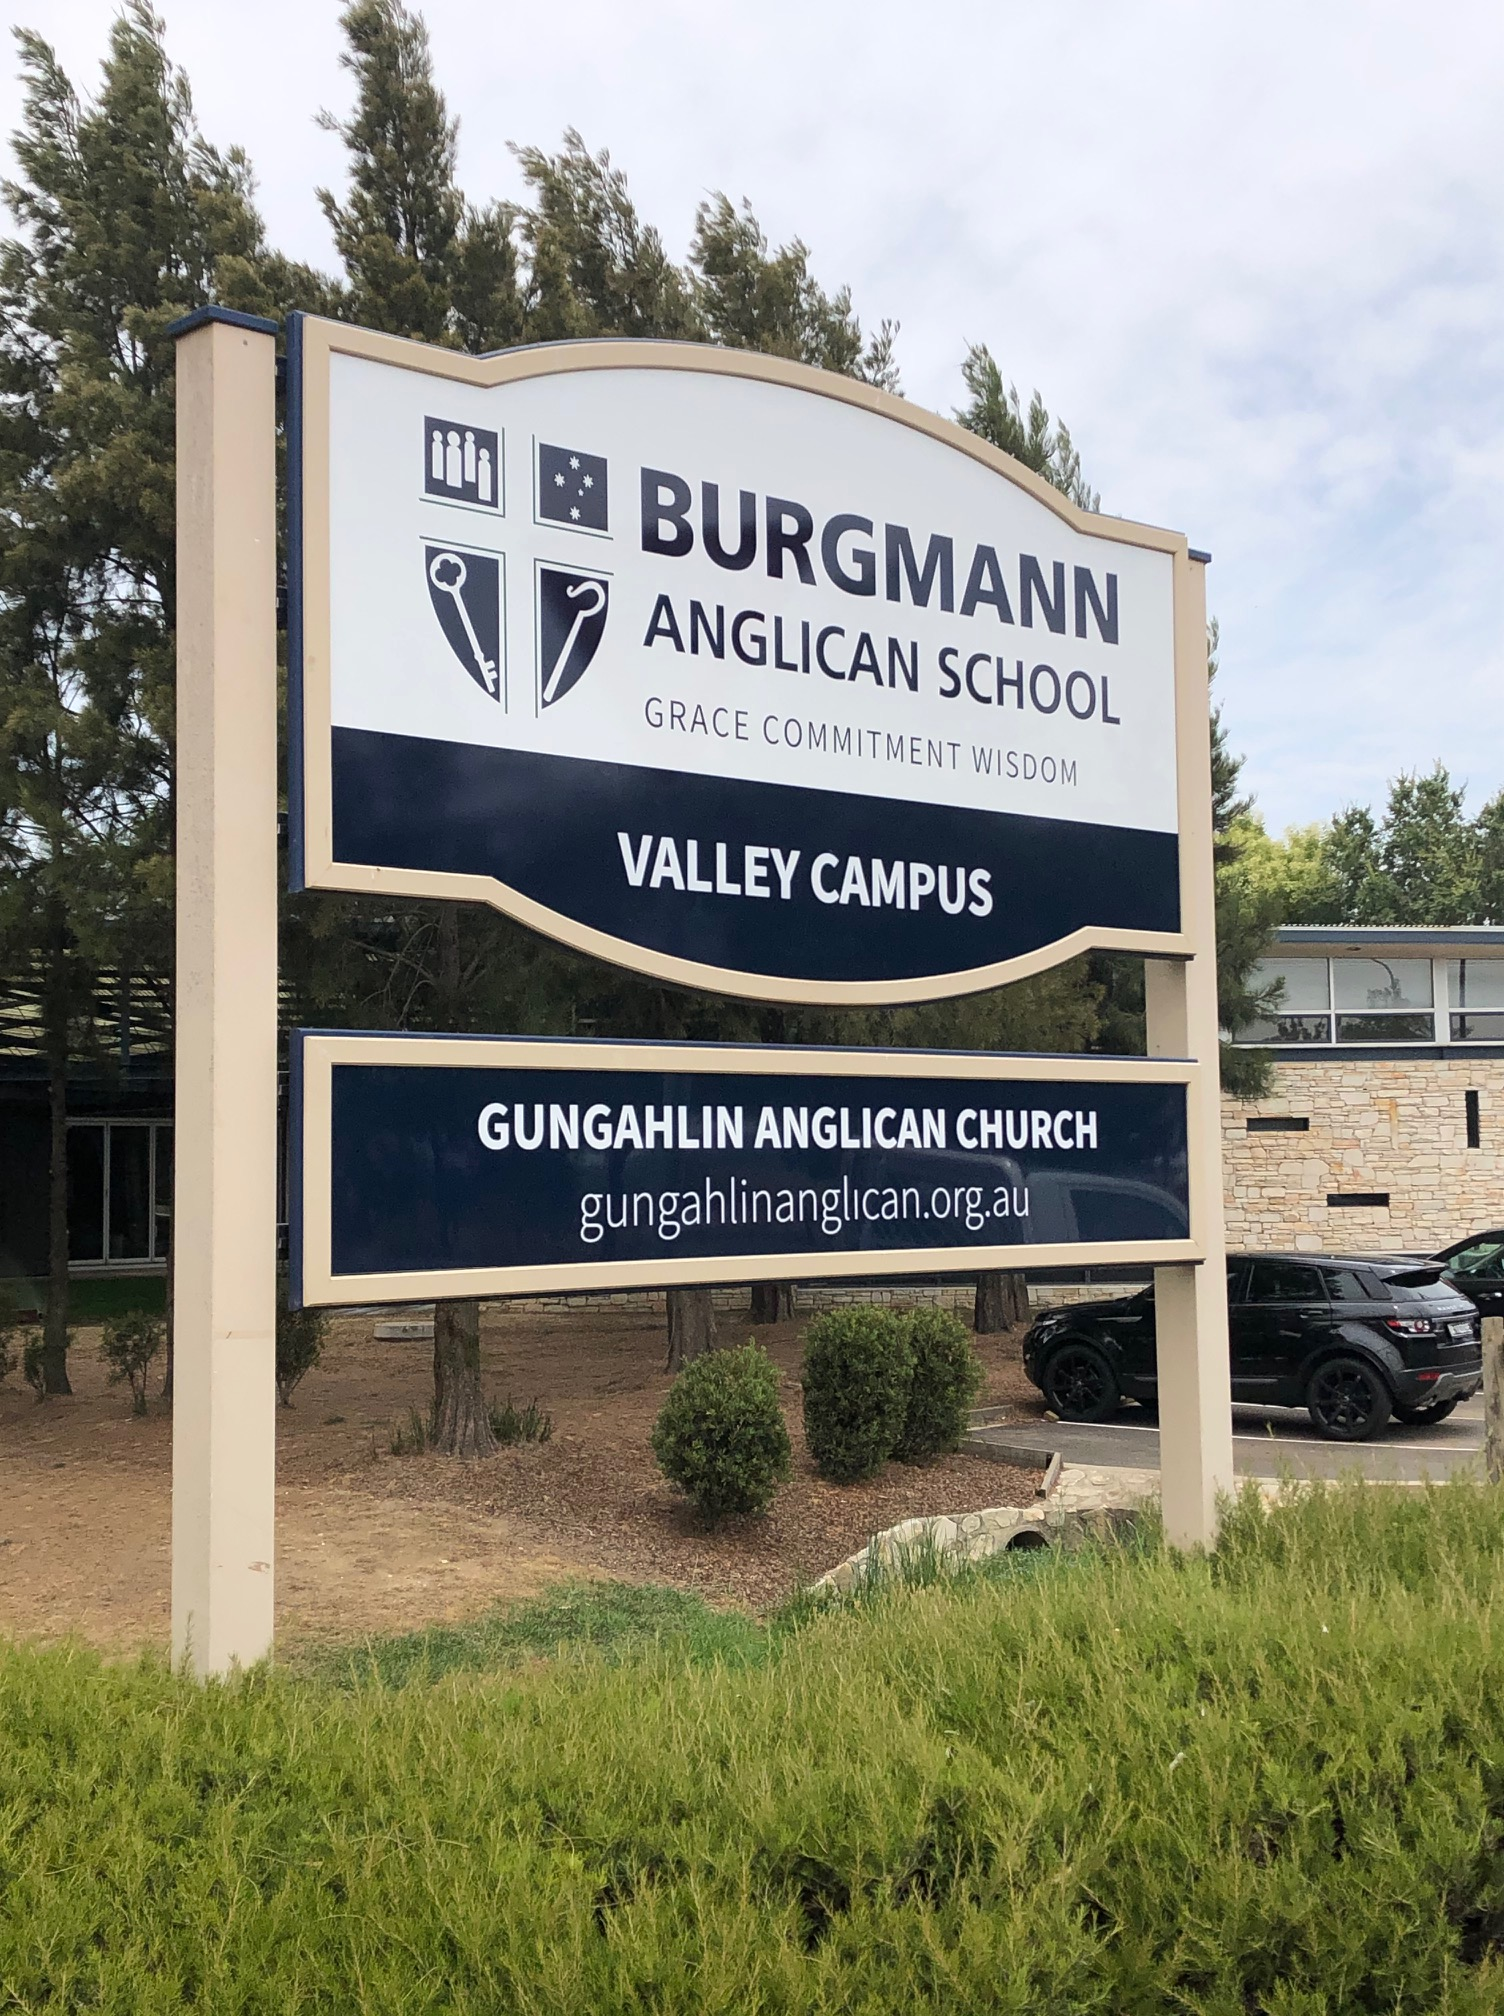 Burgmann Anglican School Signage